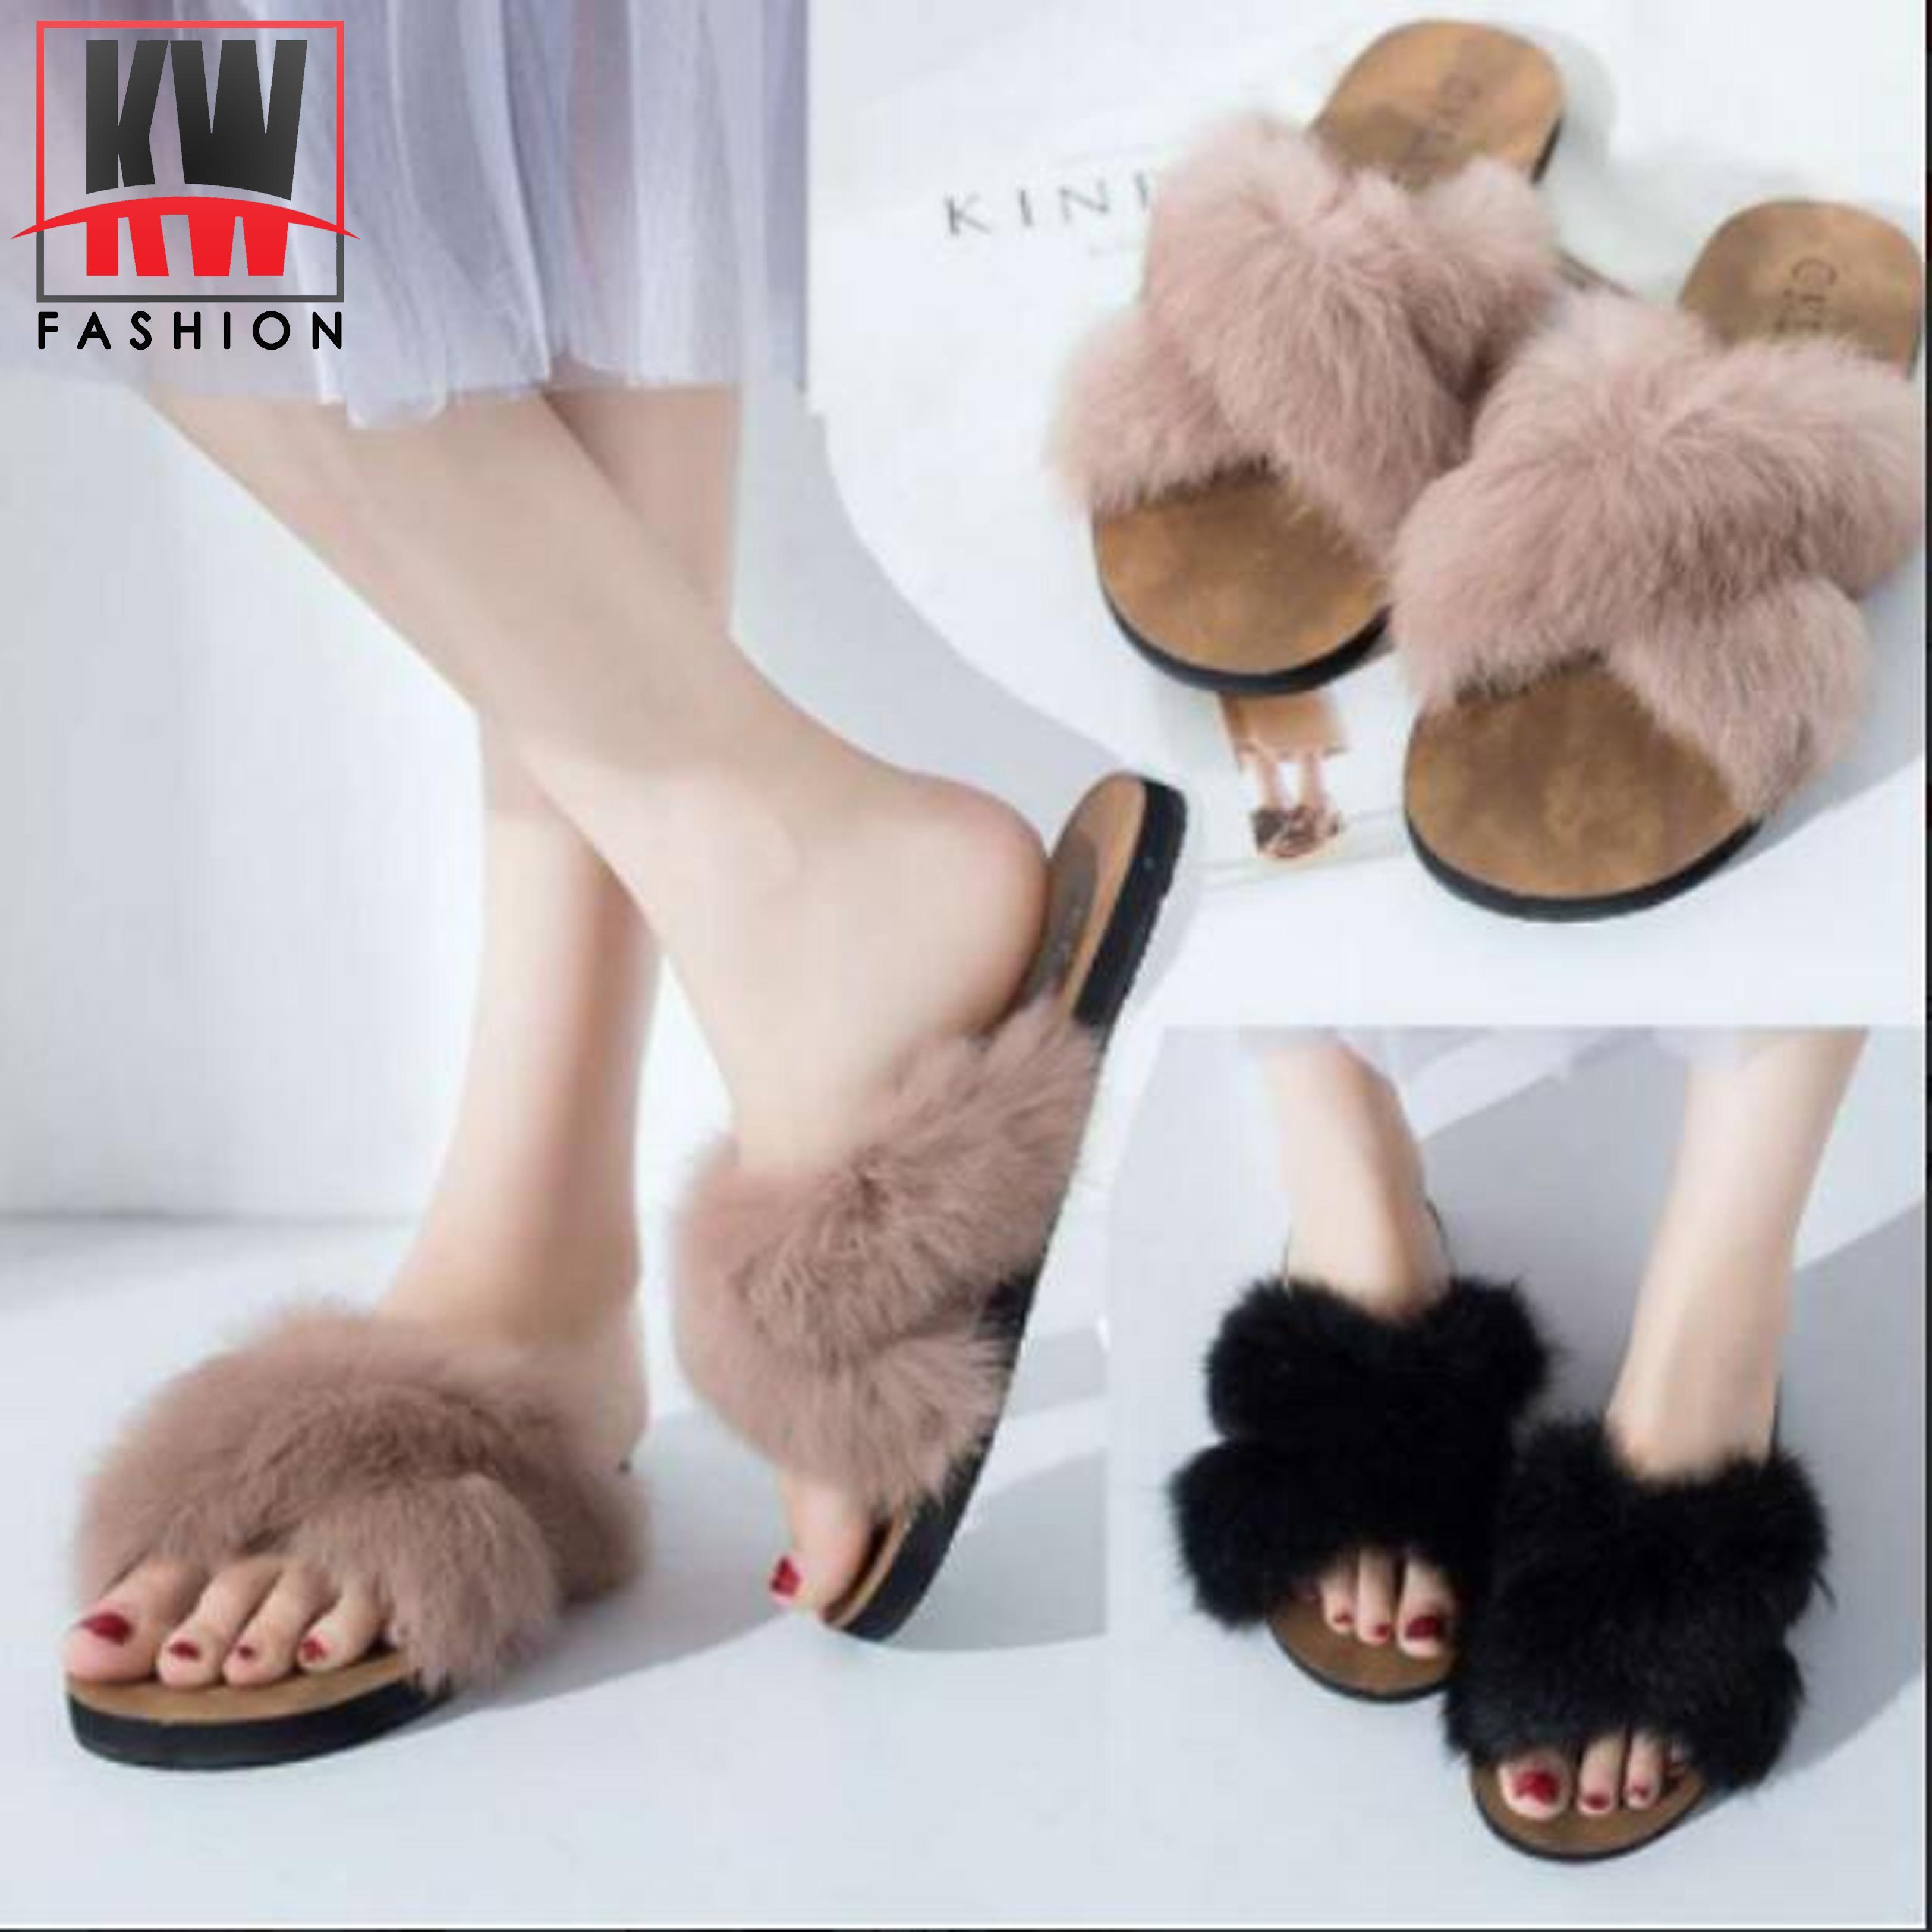 e60293dfdd1b KW Korean Ladies Summer Fur Decorate Flat Wooden Sandal KW-8812 Adjust One  Size